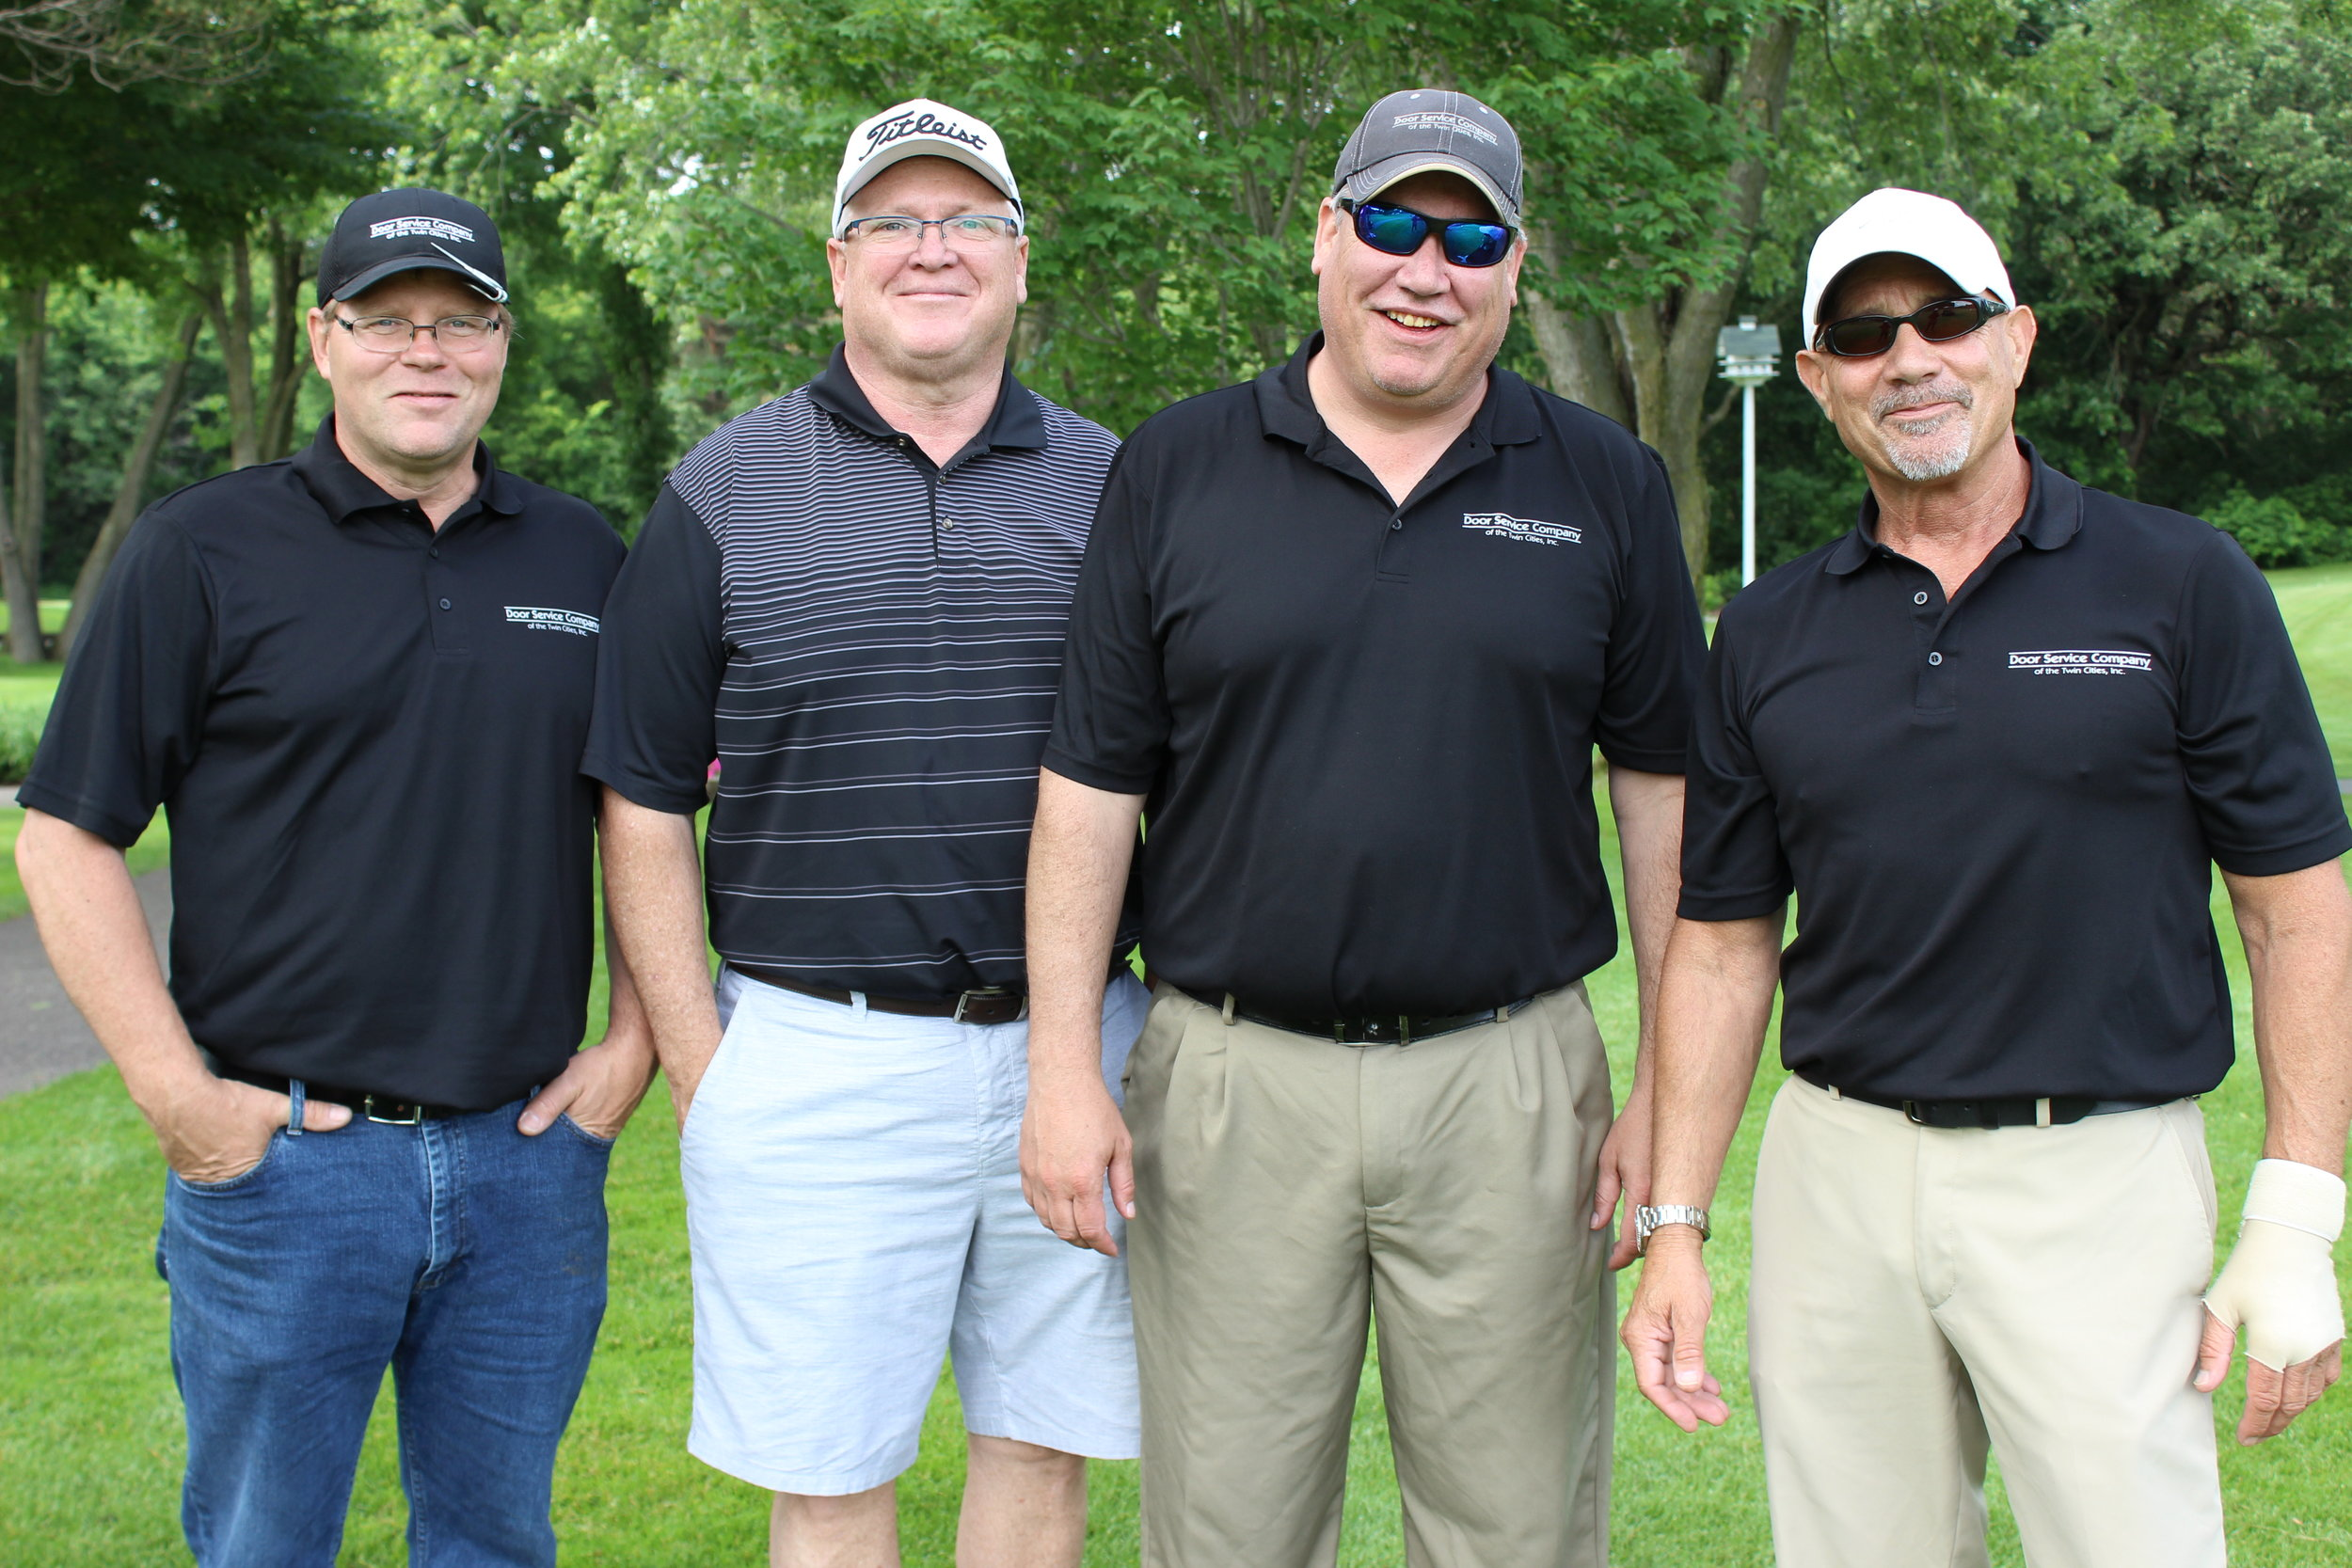 10B Door Service Company - Paul Hattenberger, JIm Svoboda, Craig Lupien, Dave Baker.JPG